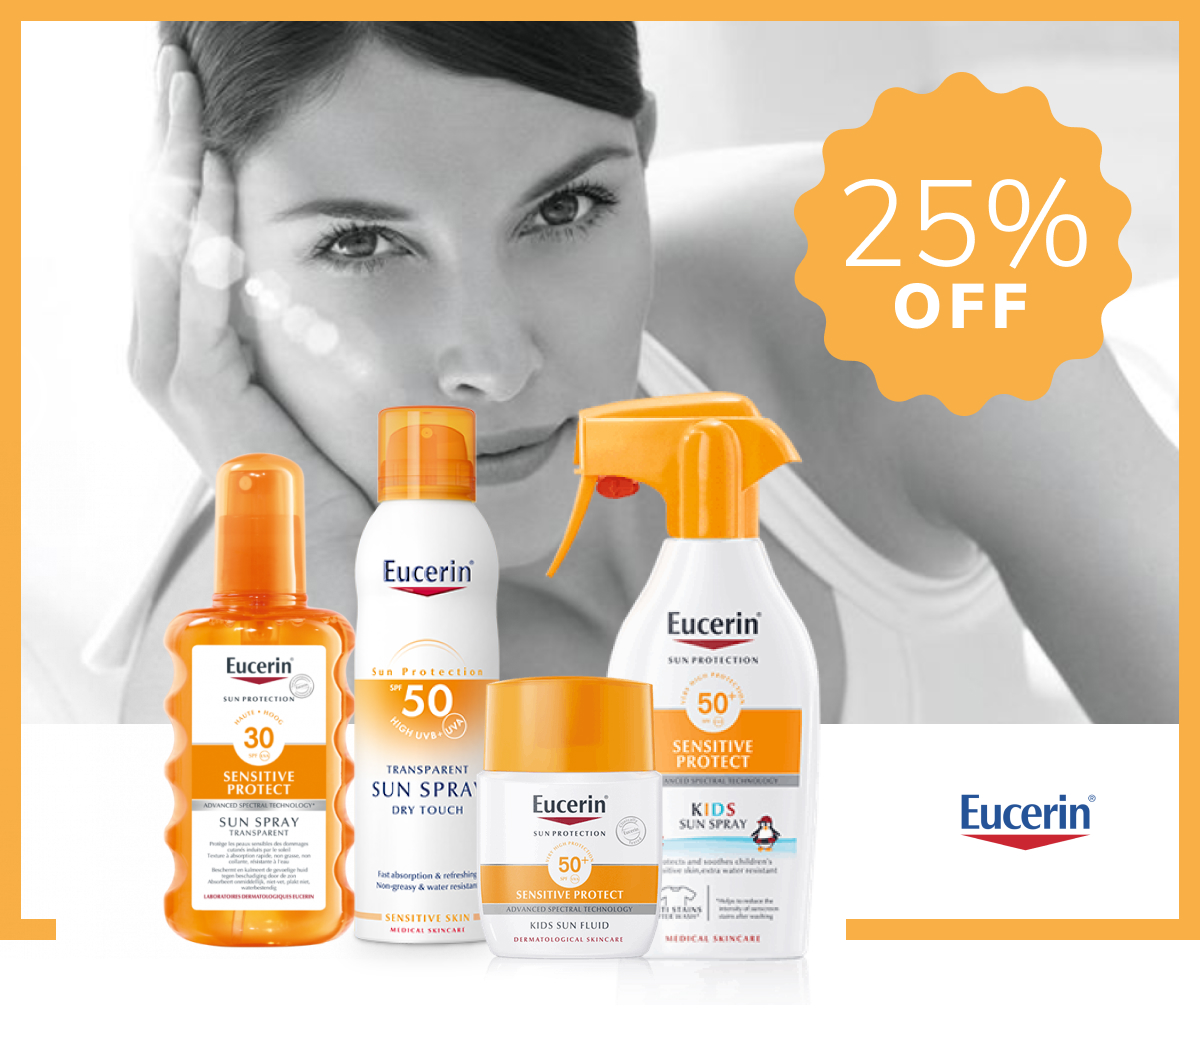 Eucerin Sunscreens